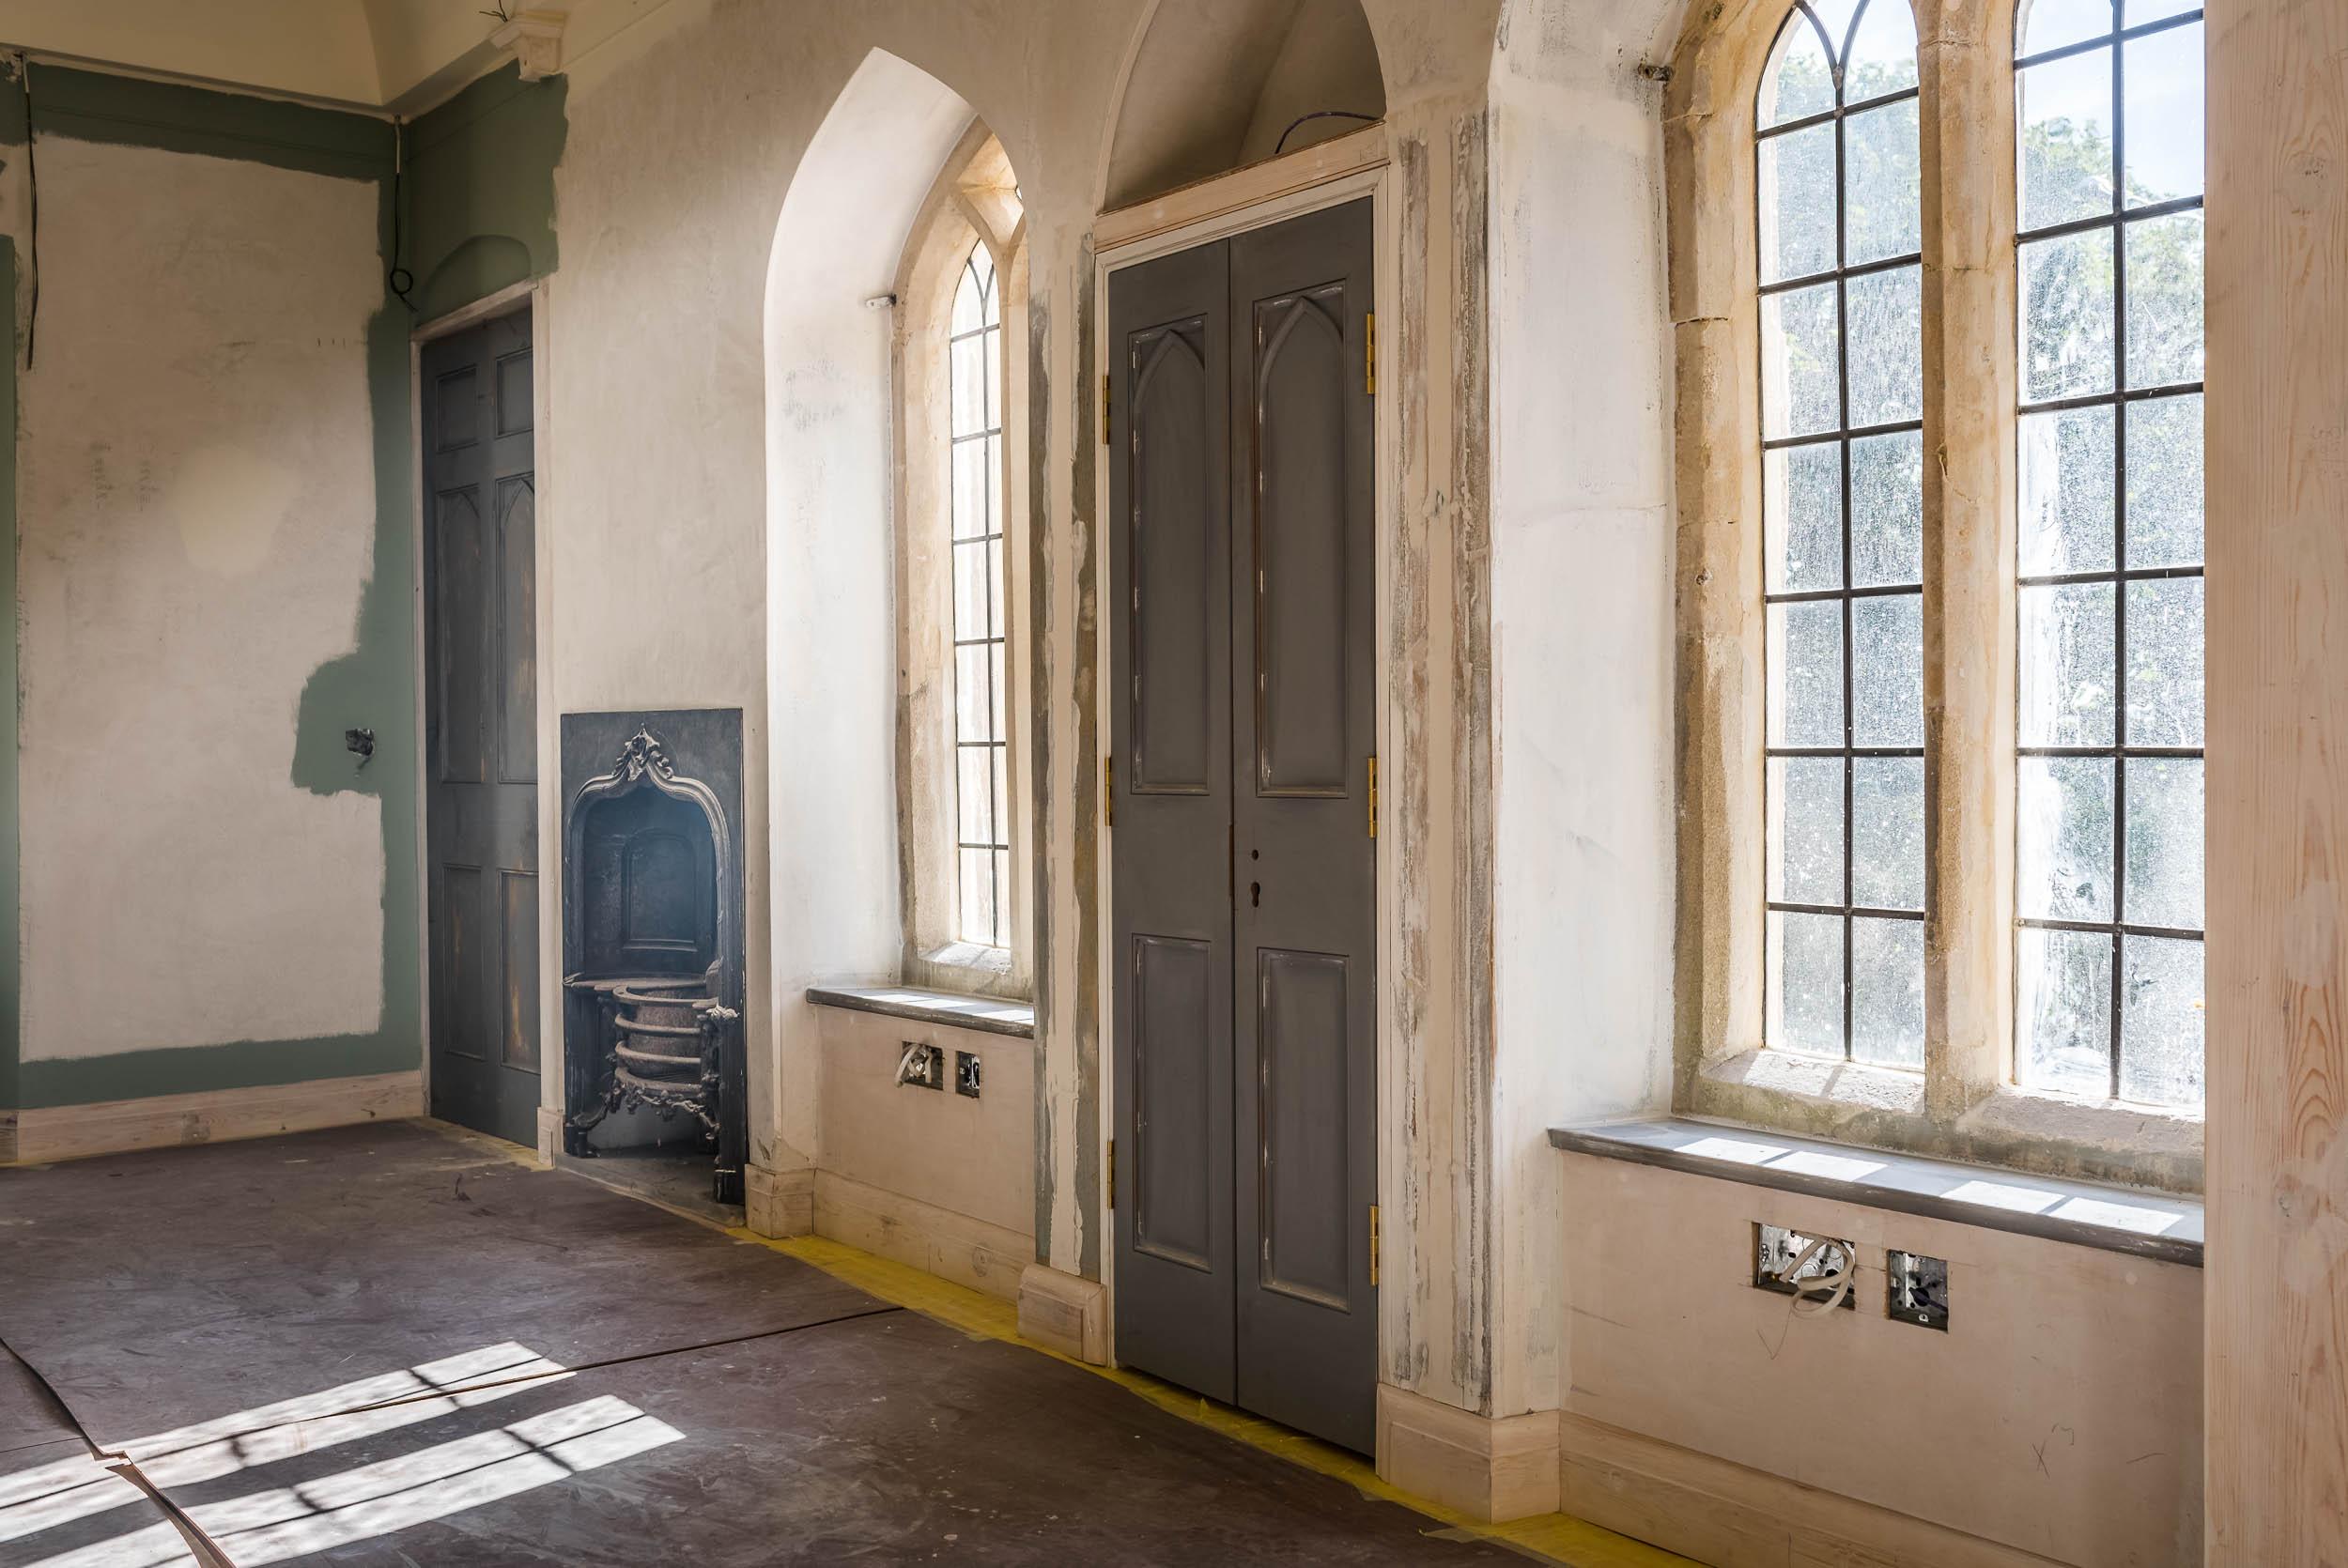 NC-nick-church-photography-architectural-0003.jpg